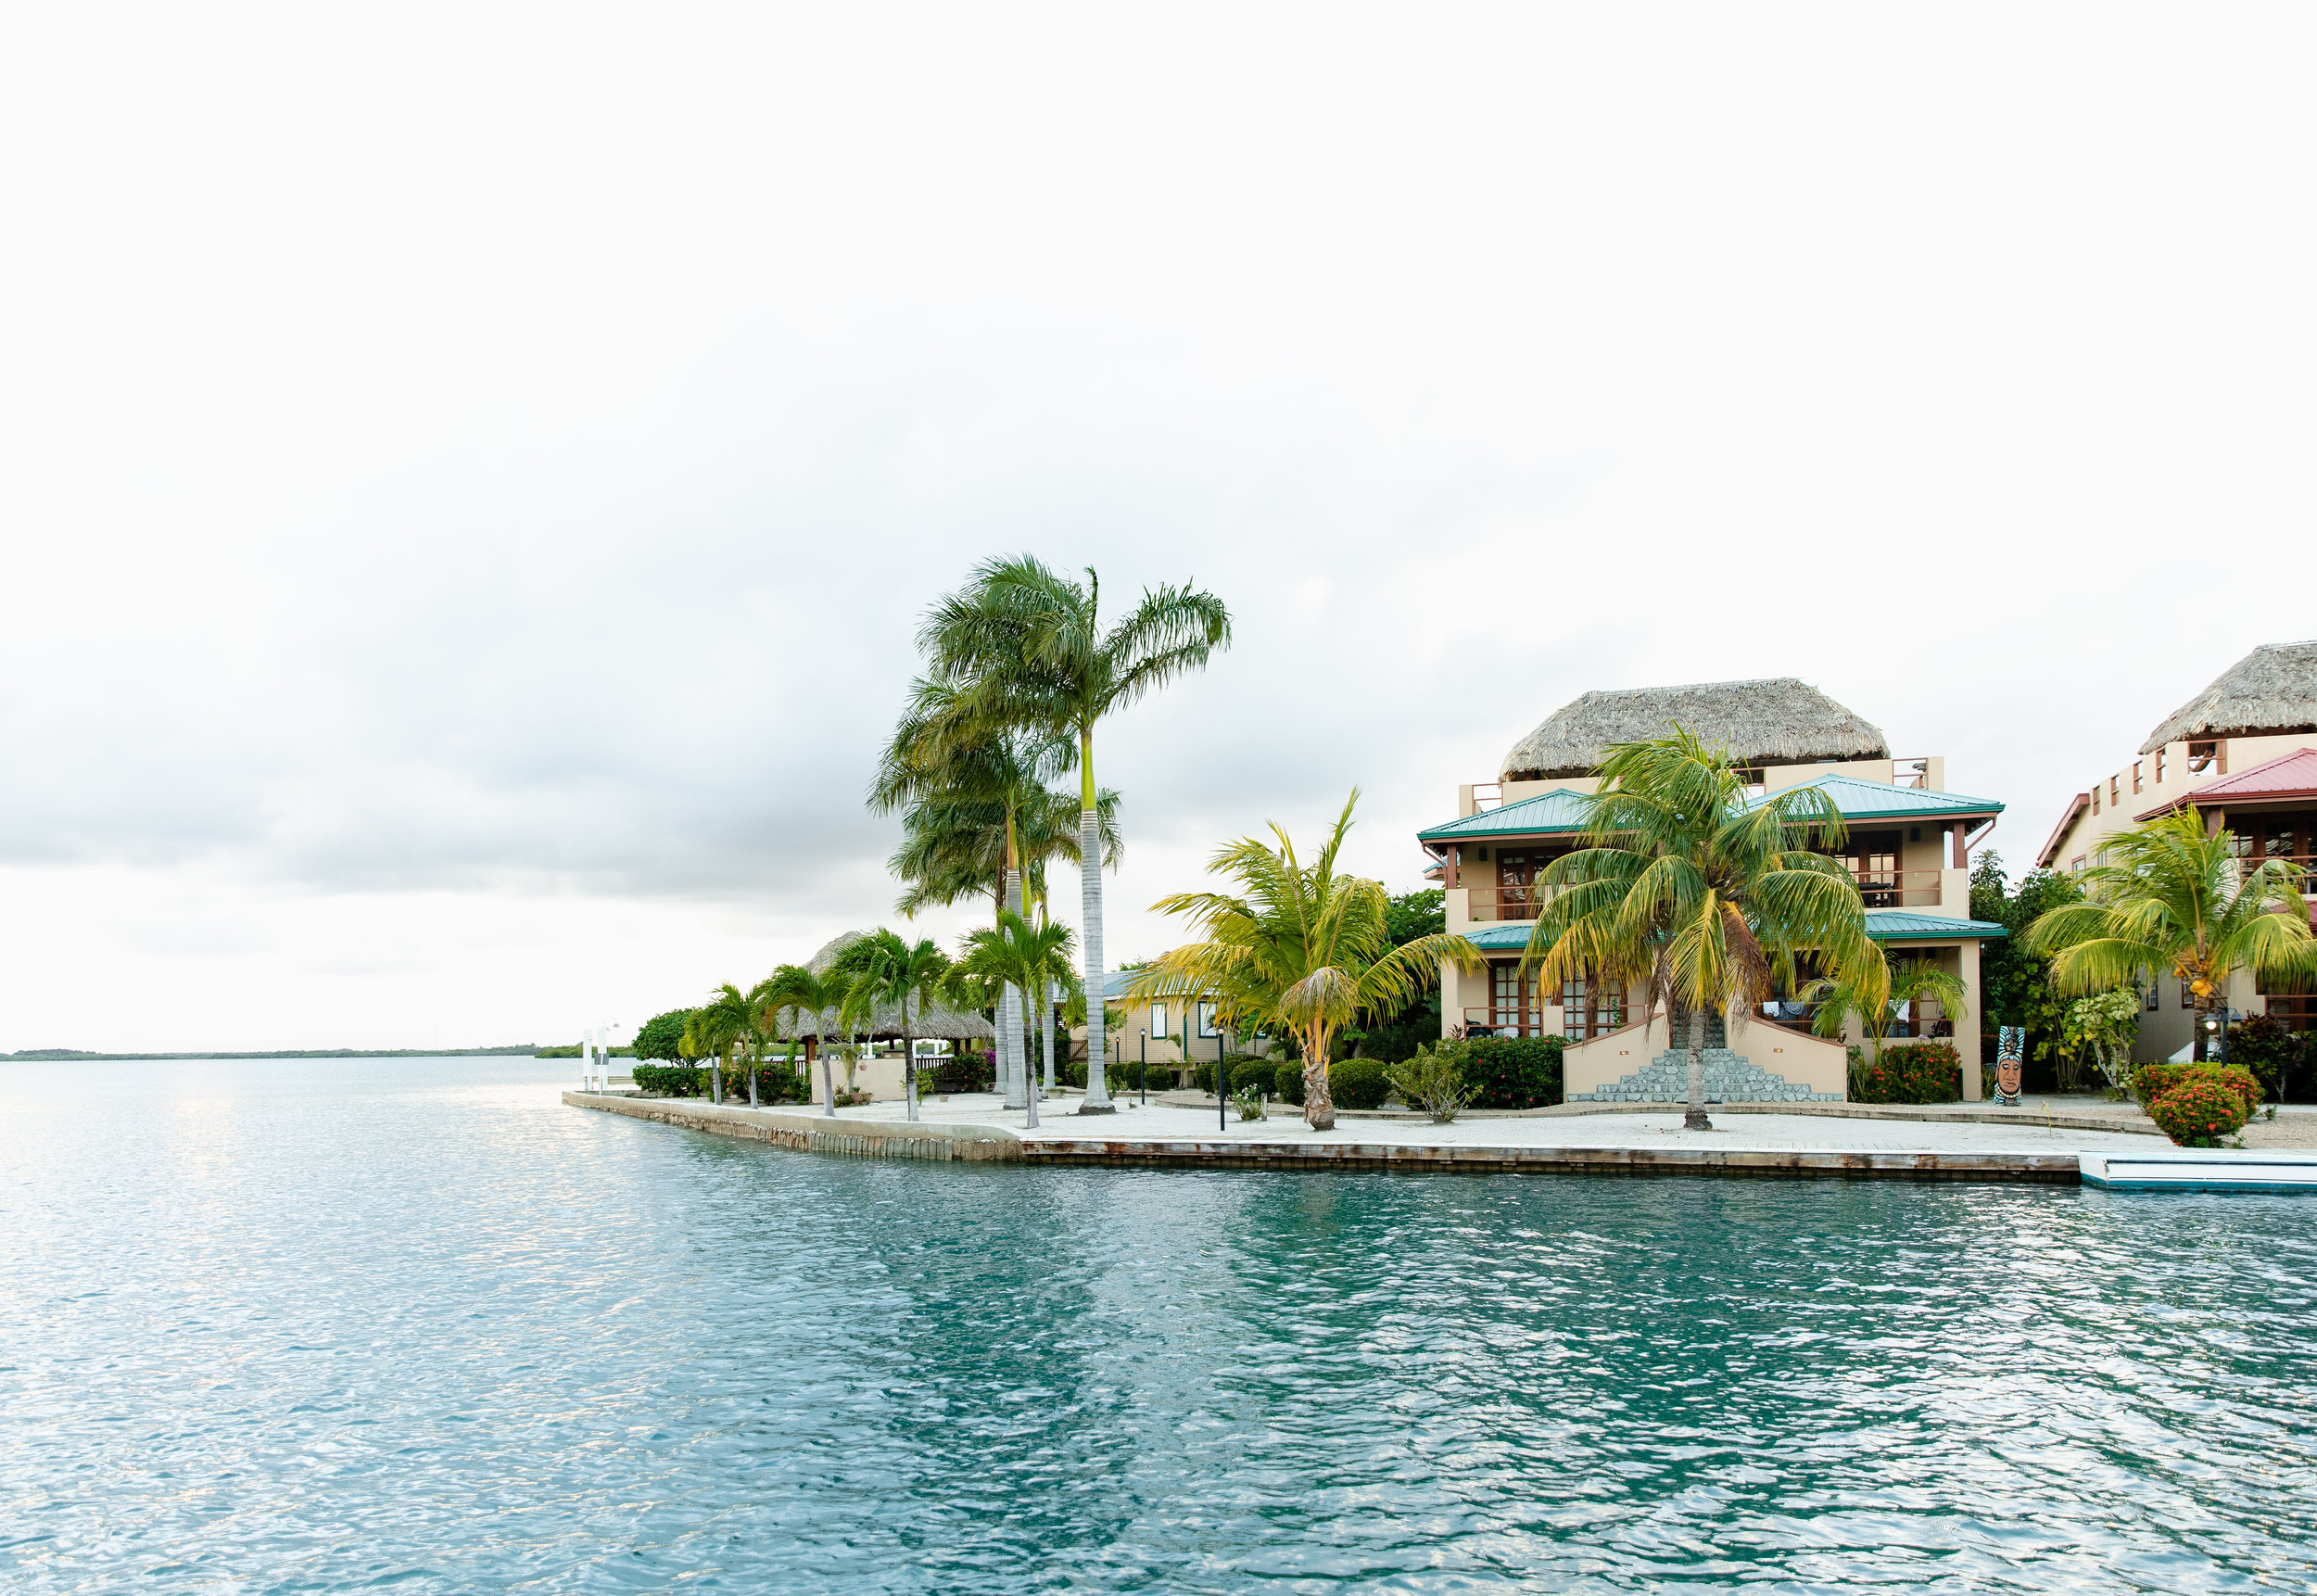 Belize Photos Edited-6.jpg